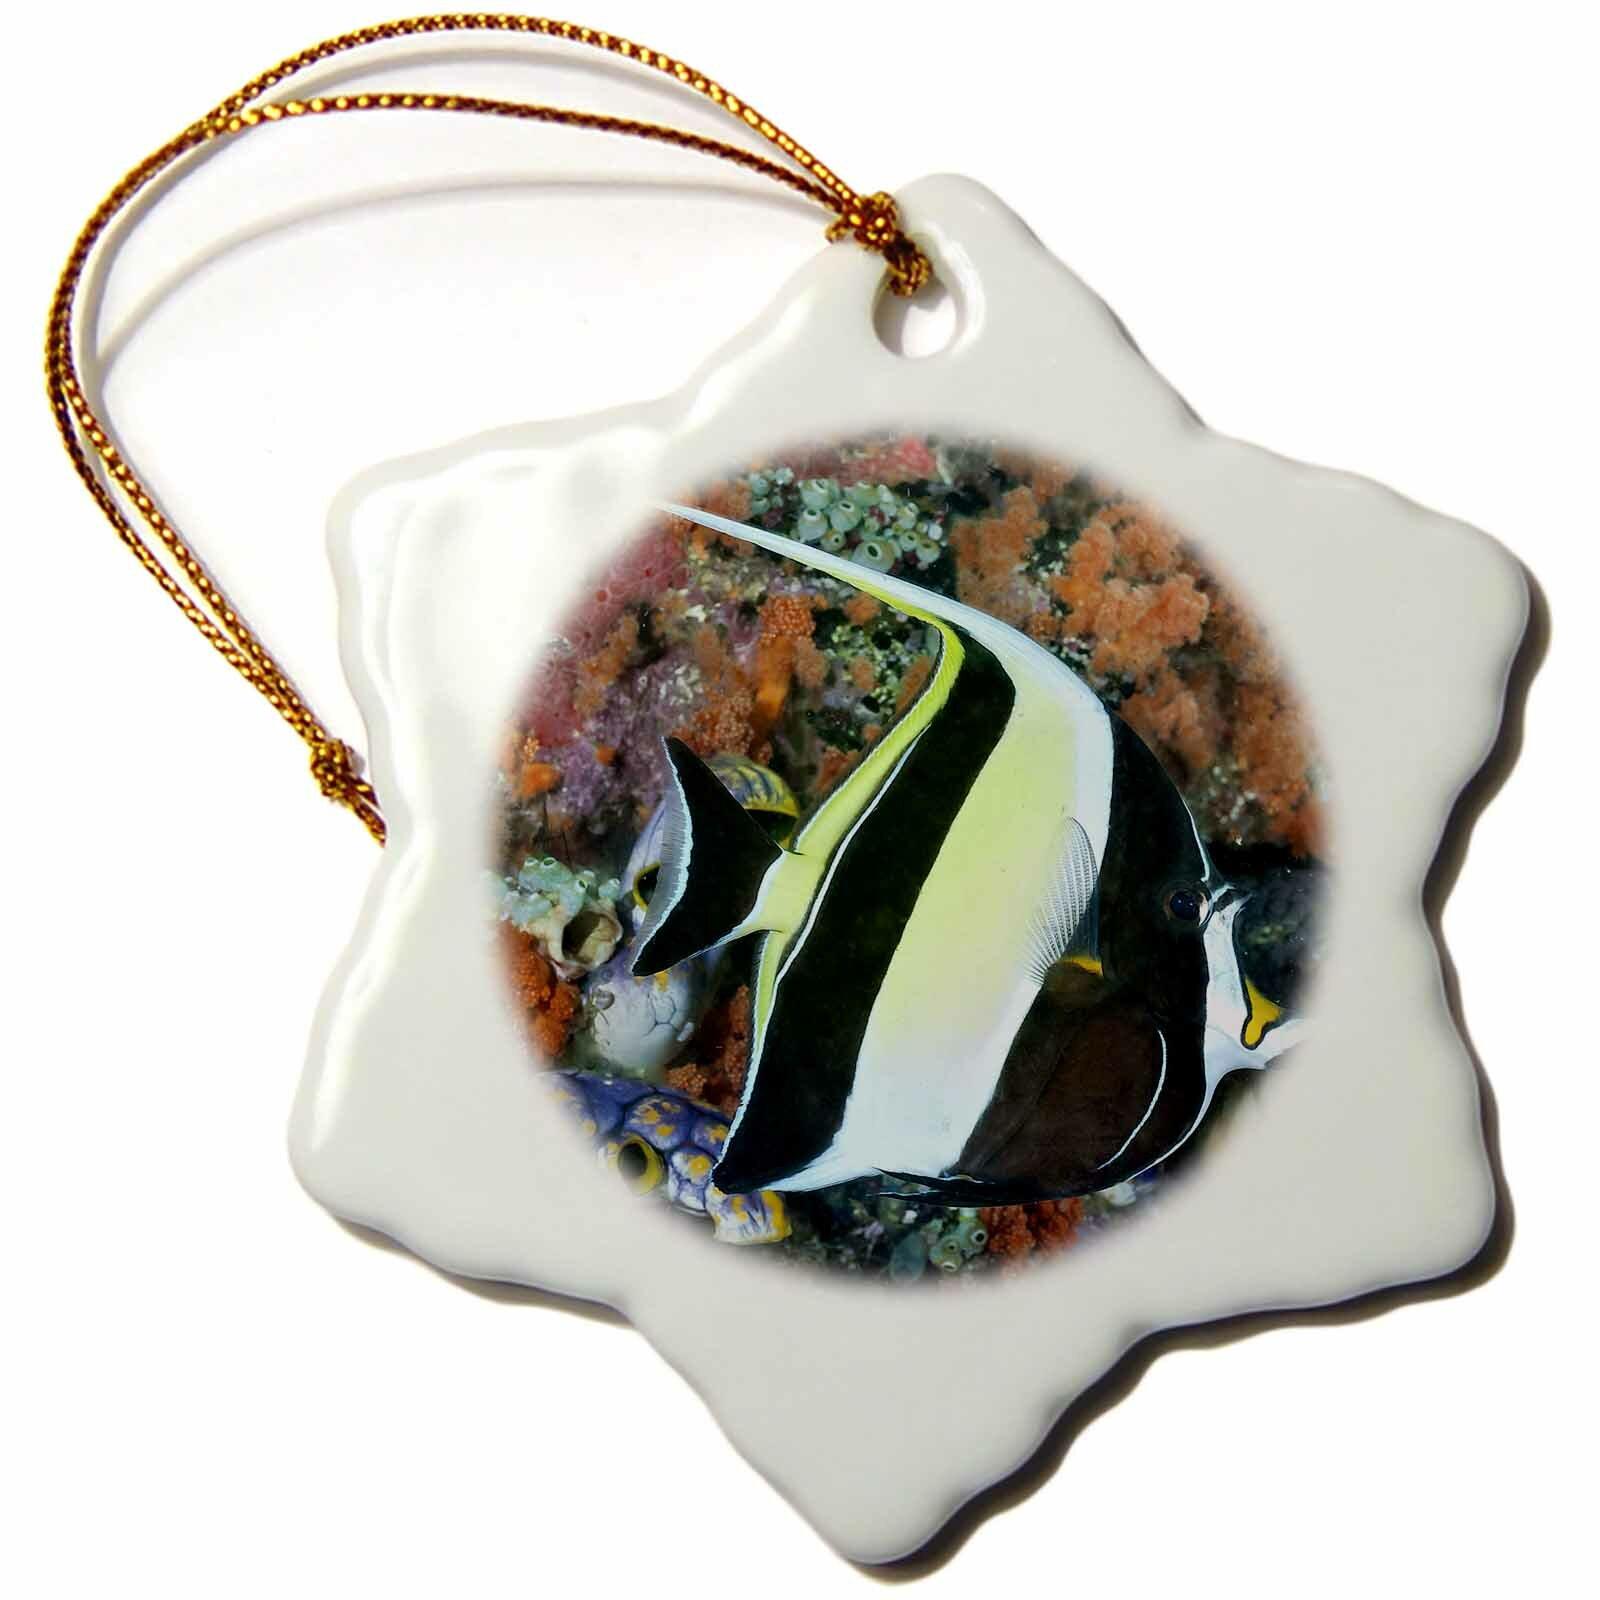 The Holiday Aisle Indonesia Papua Raja Ampat Scenic Of Moorish Idolfish And Coral Snowflake Holiday Shaped Ornament Wayfair